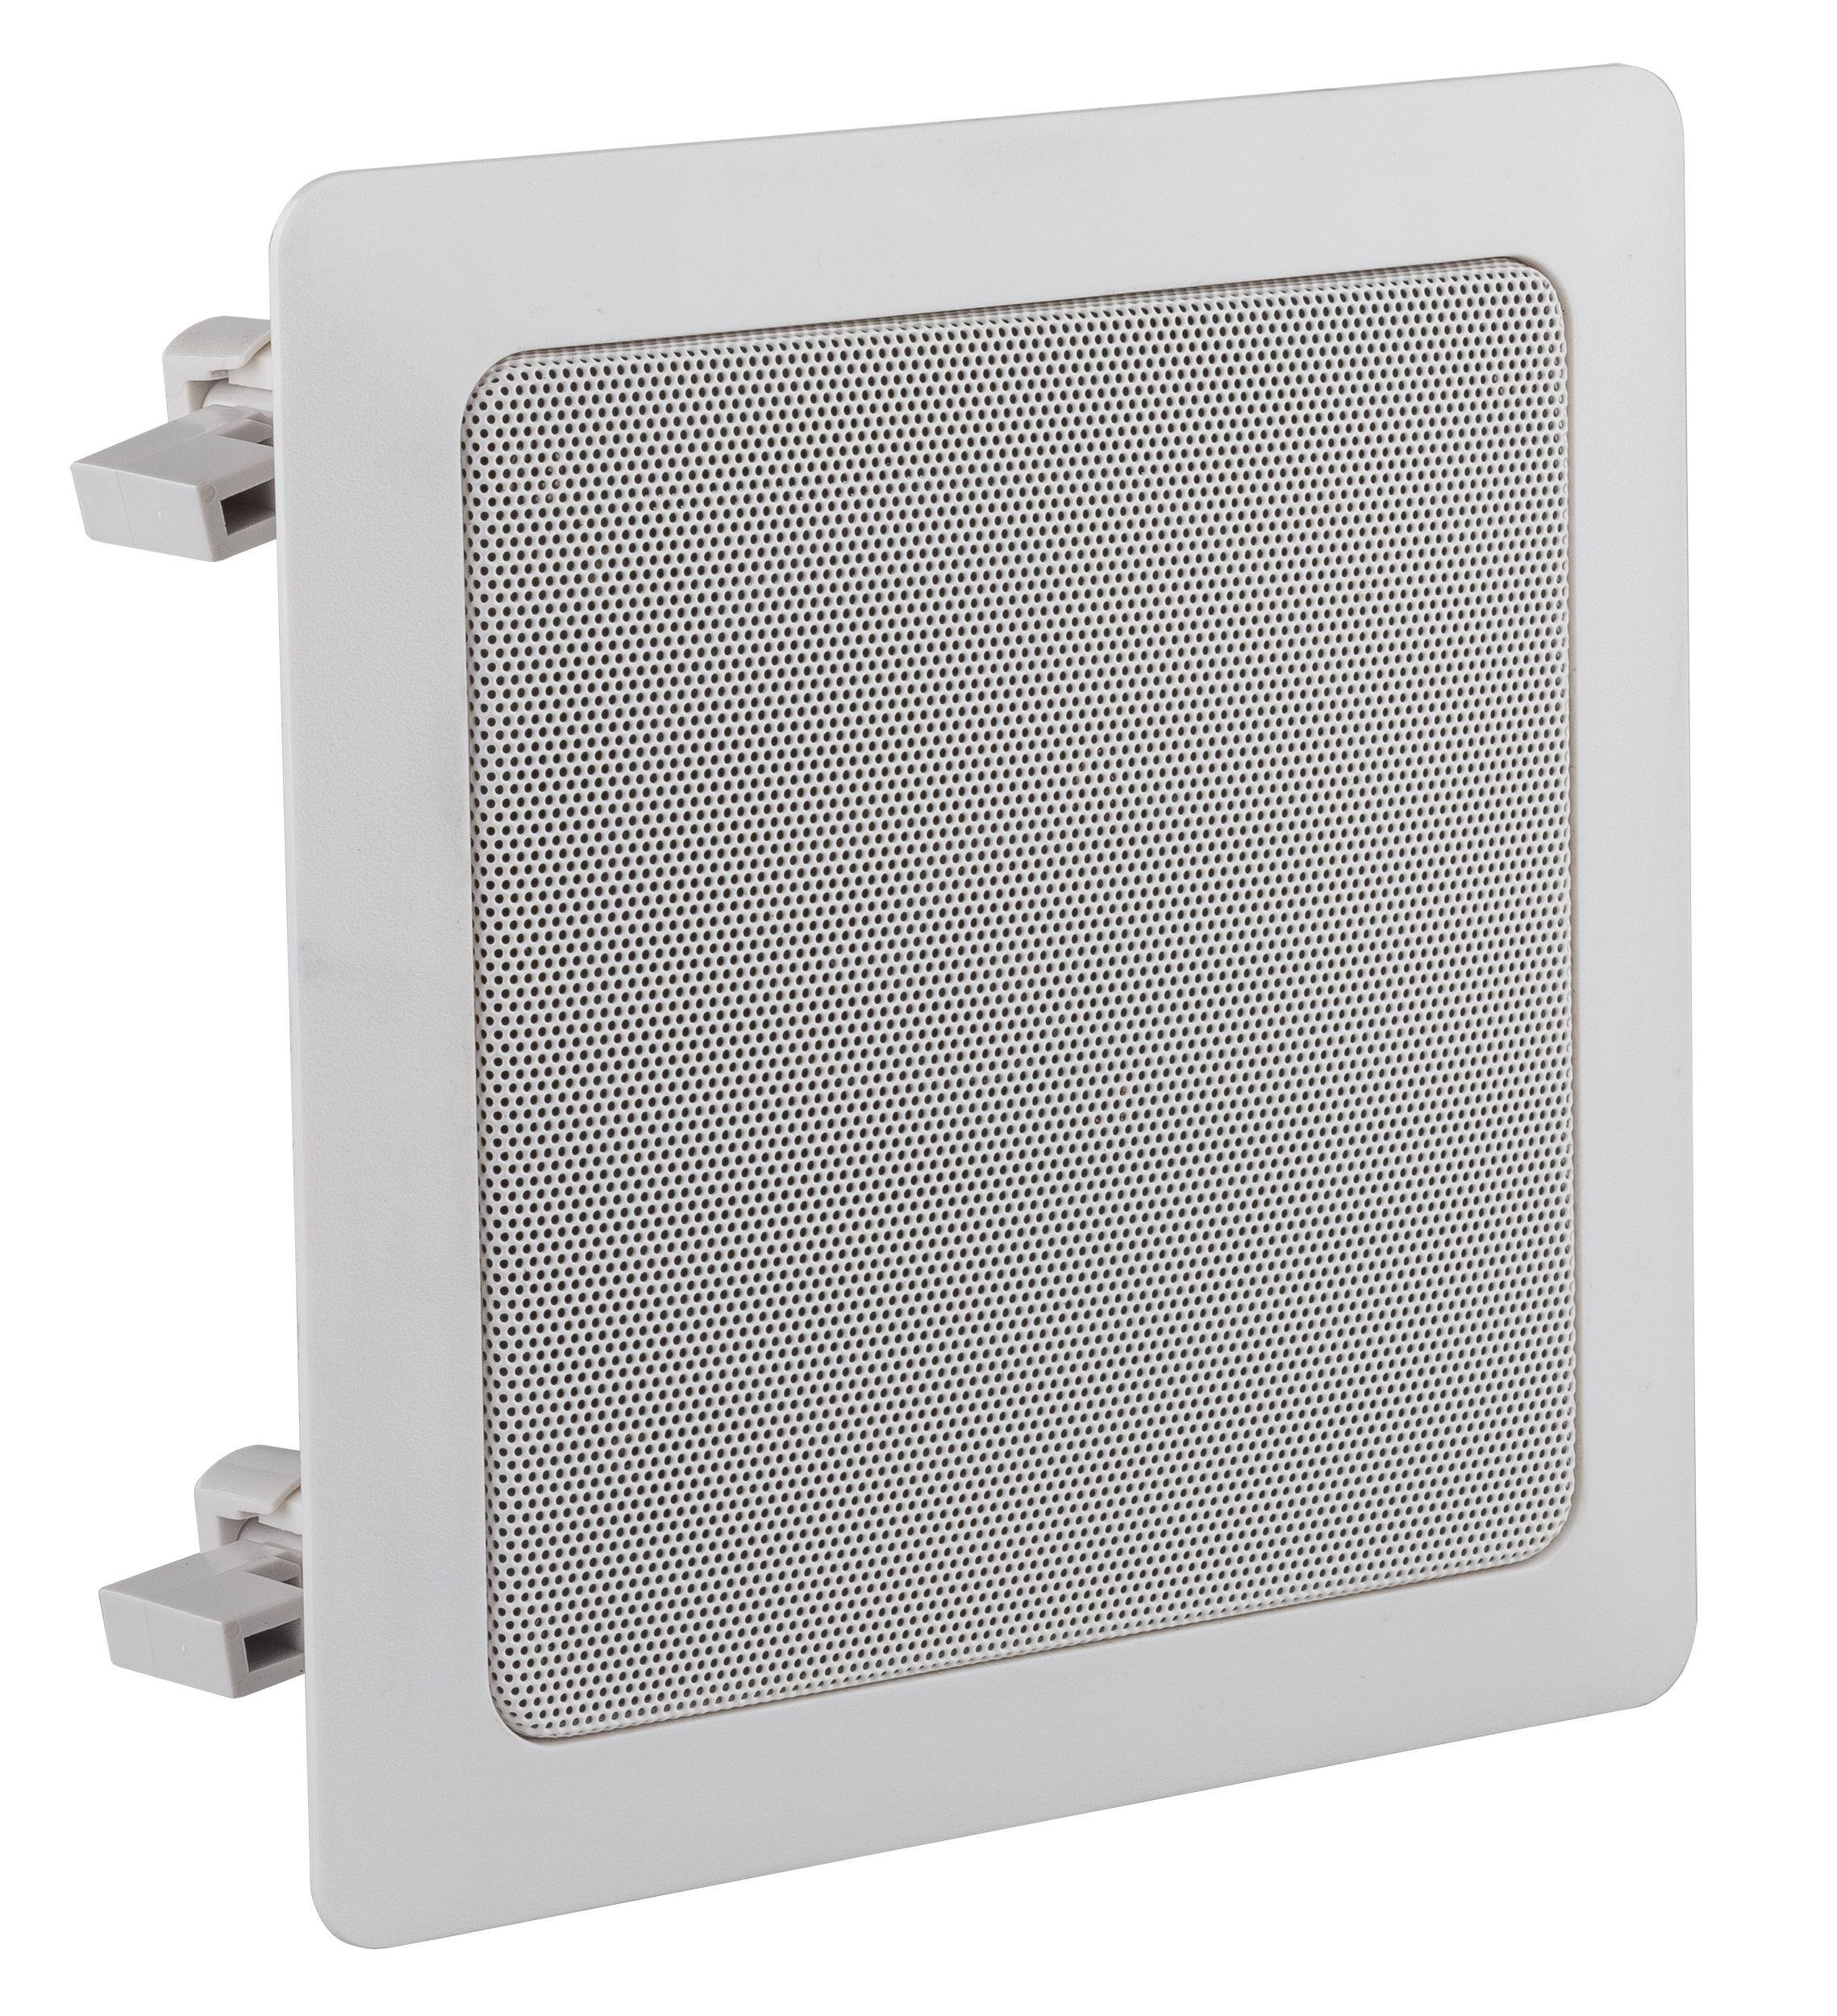 Square recessed ceiling speaker 100V 7.5/15/30W RMS